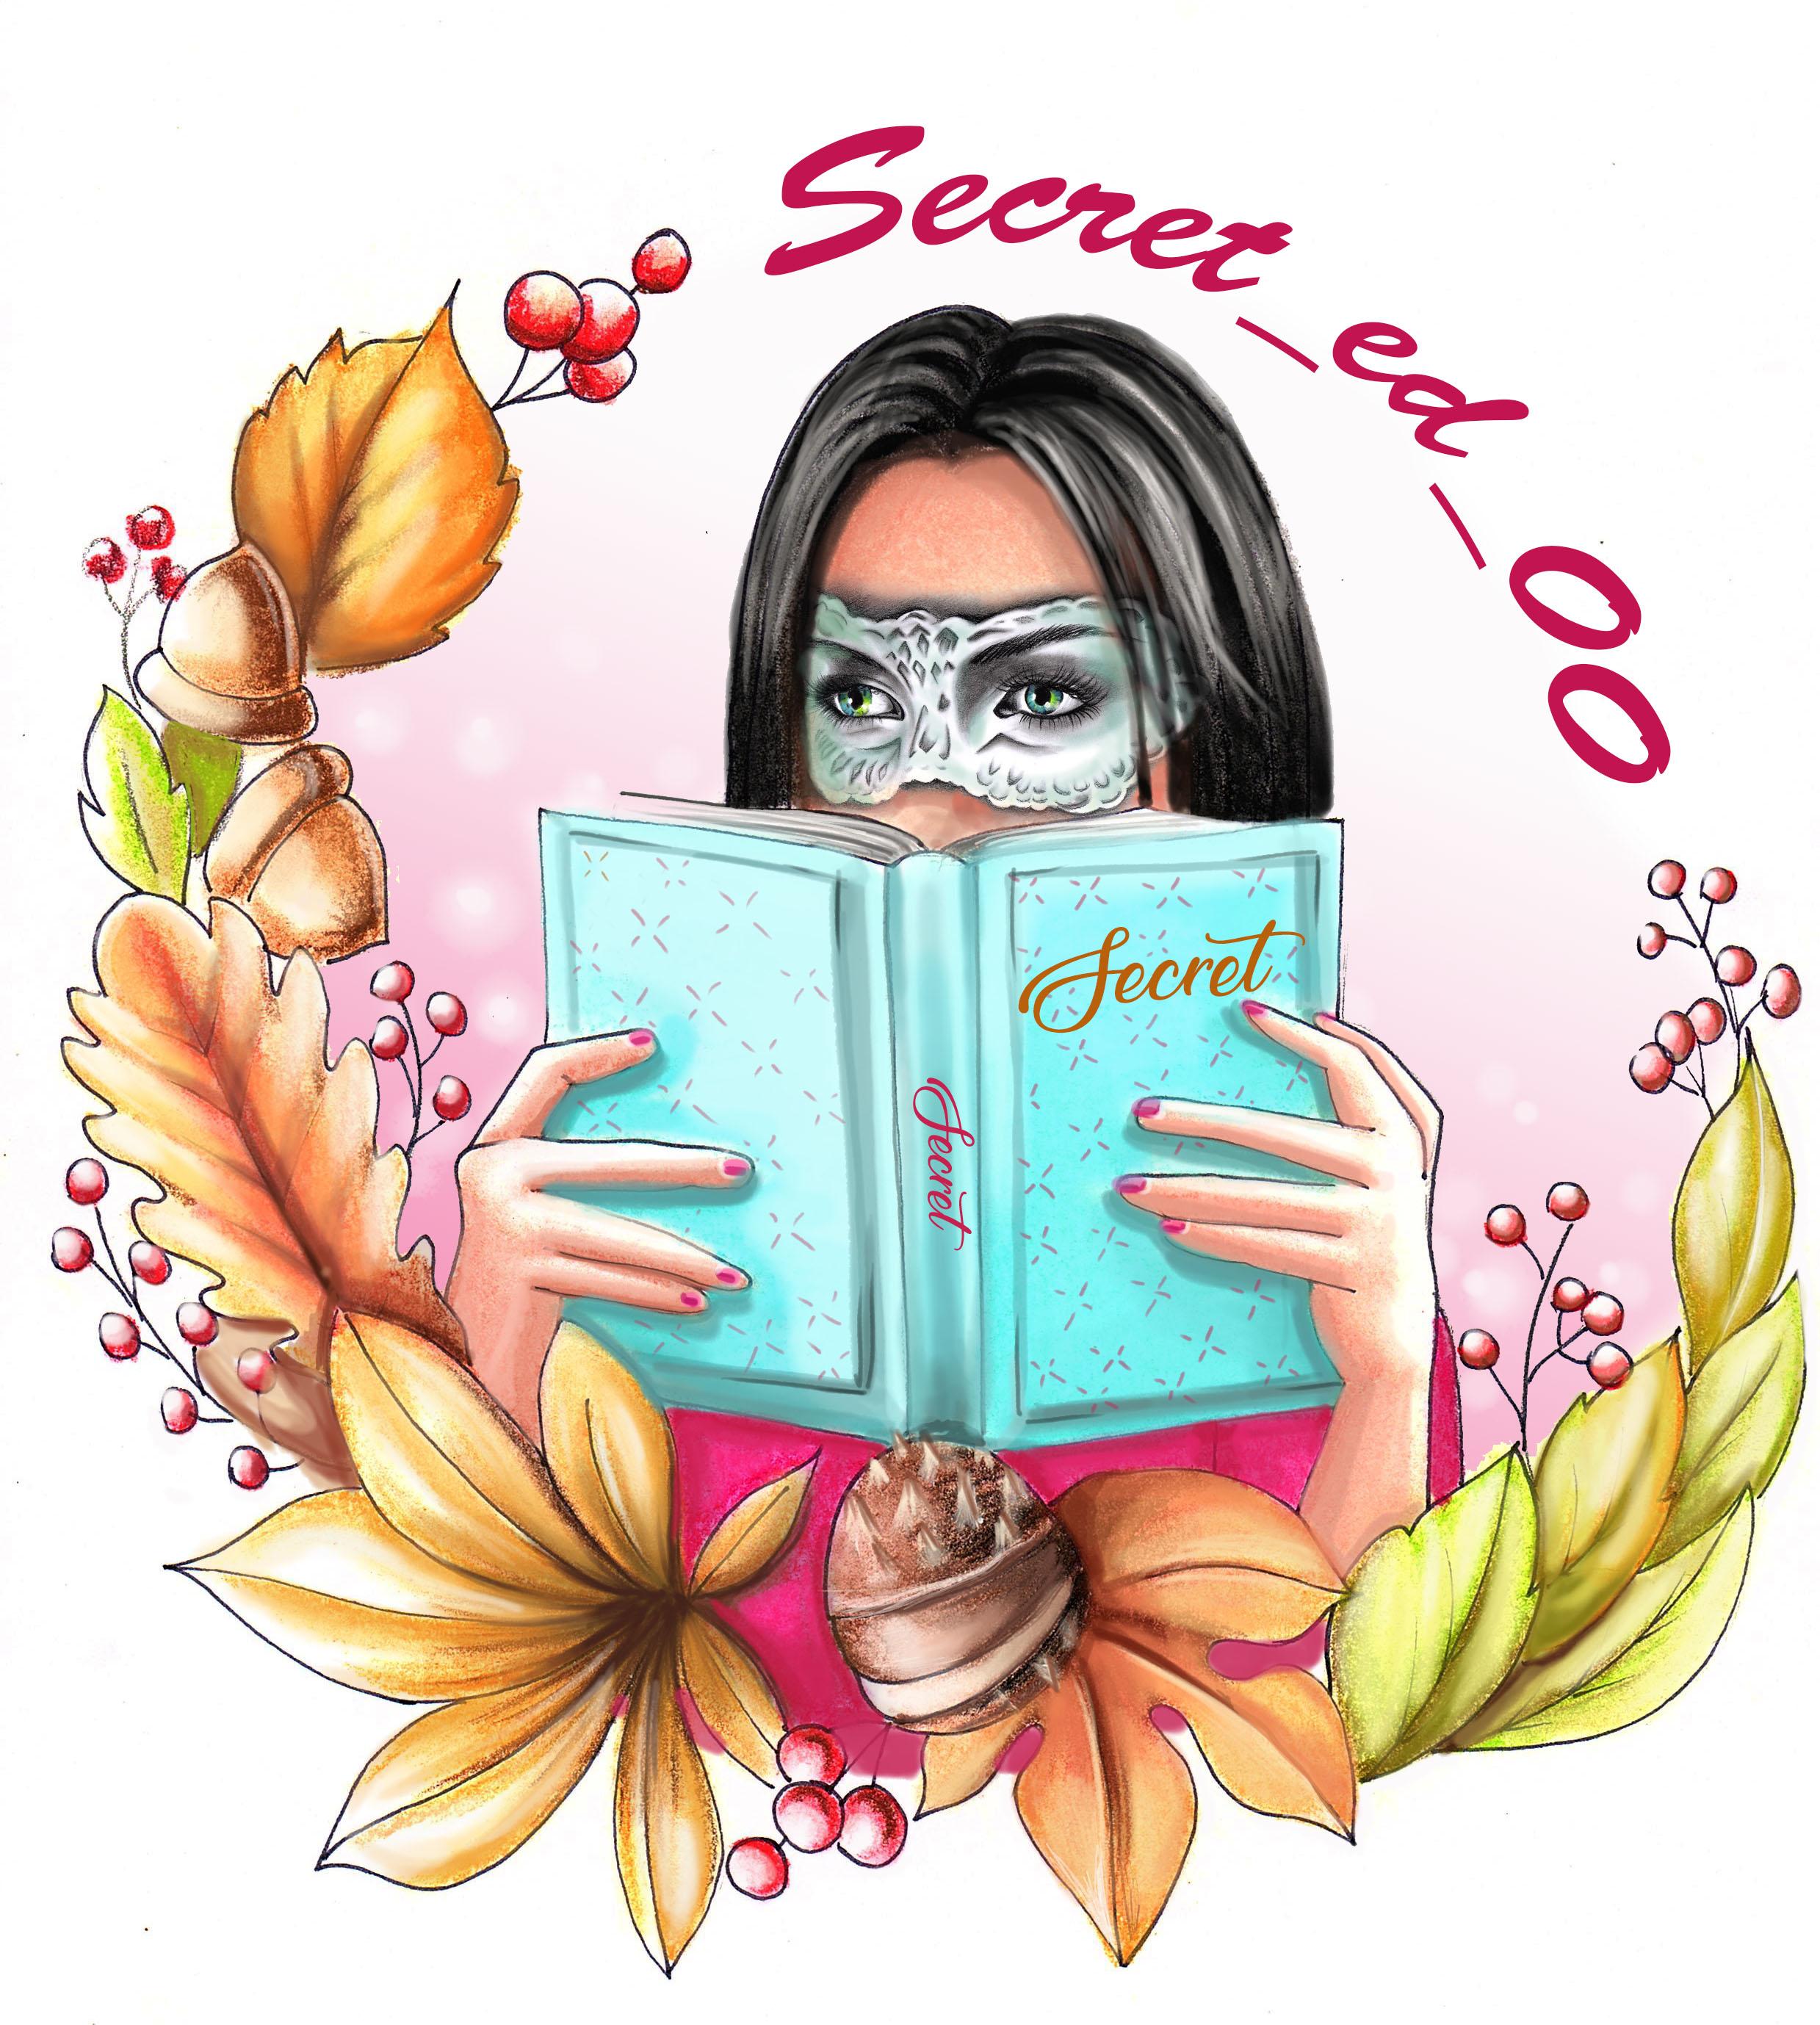 secret_ed_00